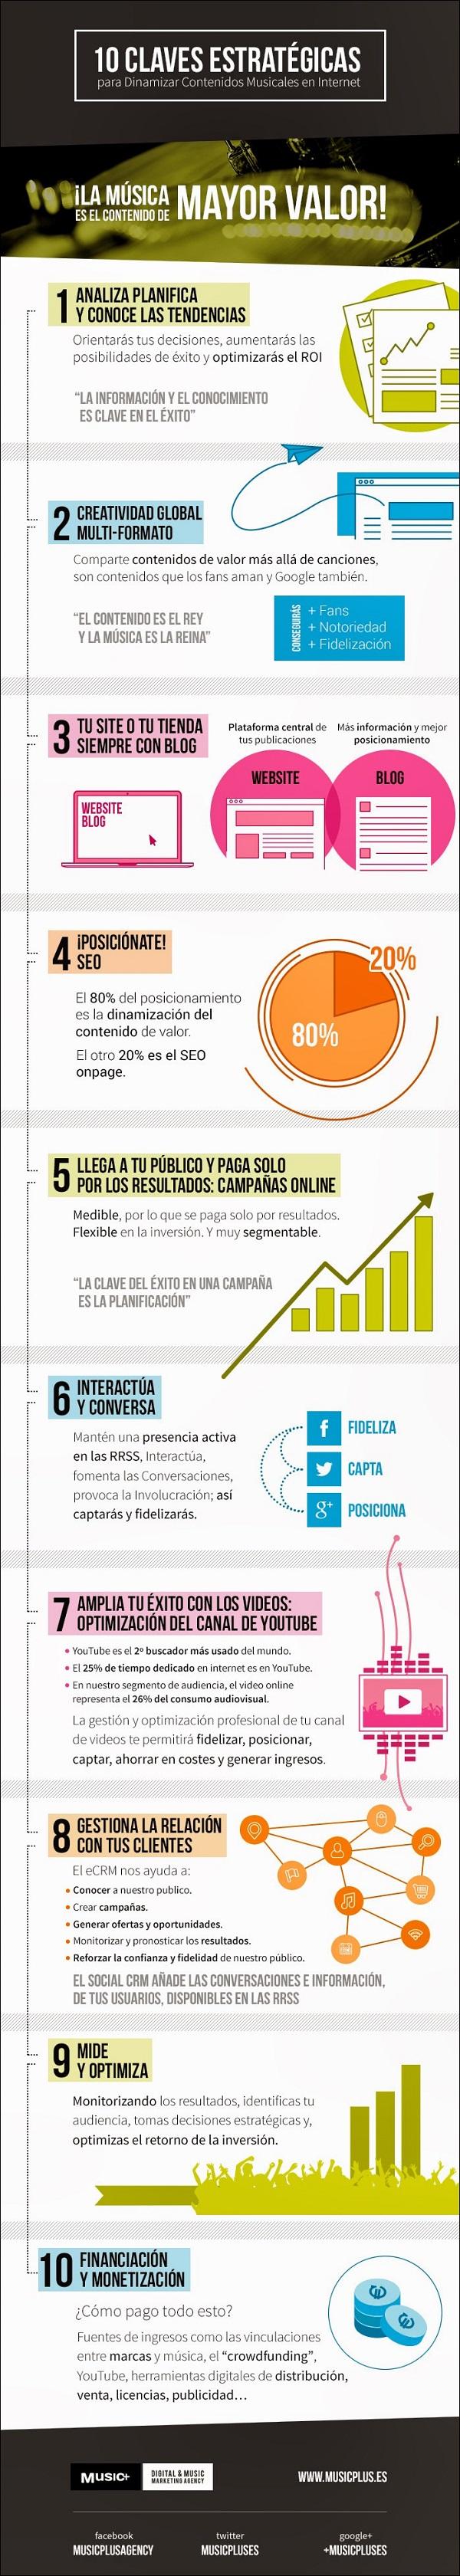 musicplus_infografia (1)